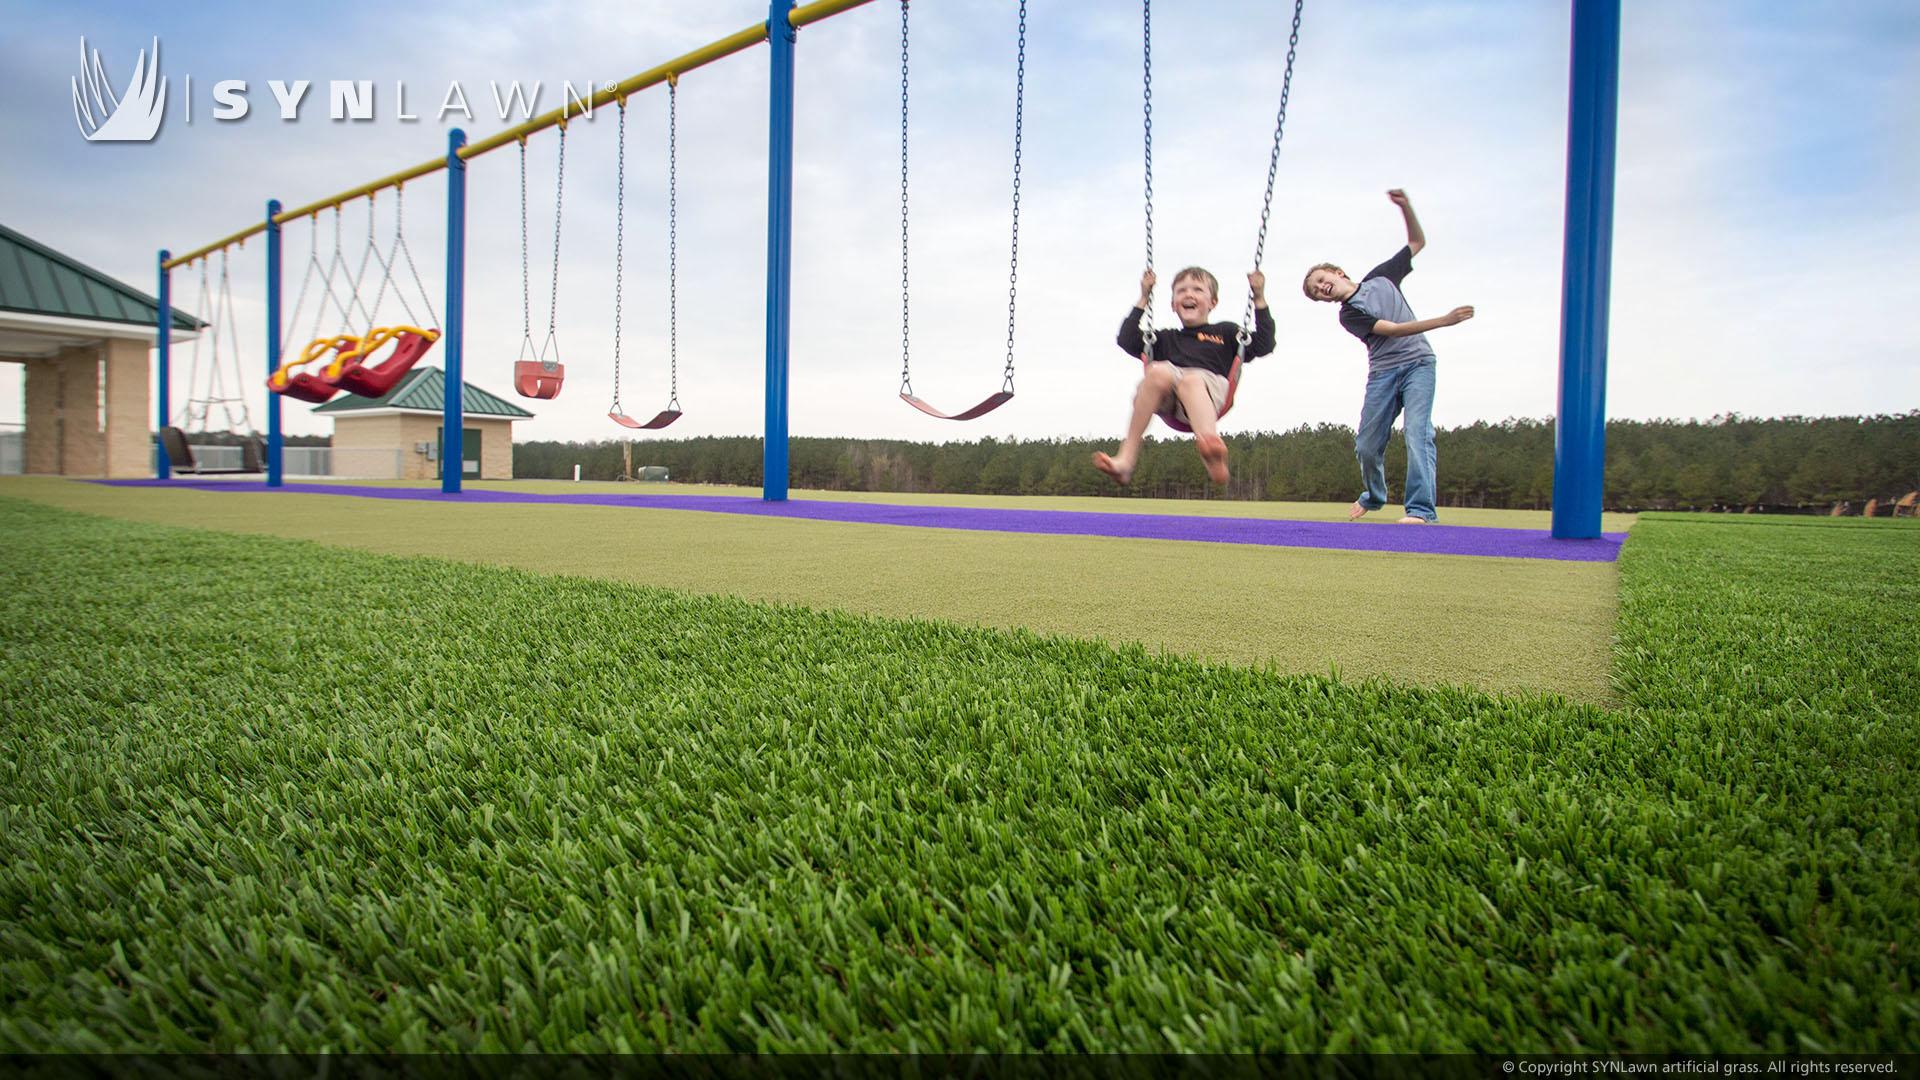 artificial grass for community park